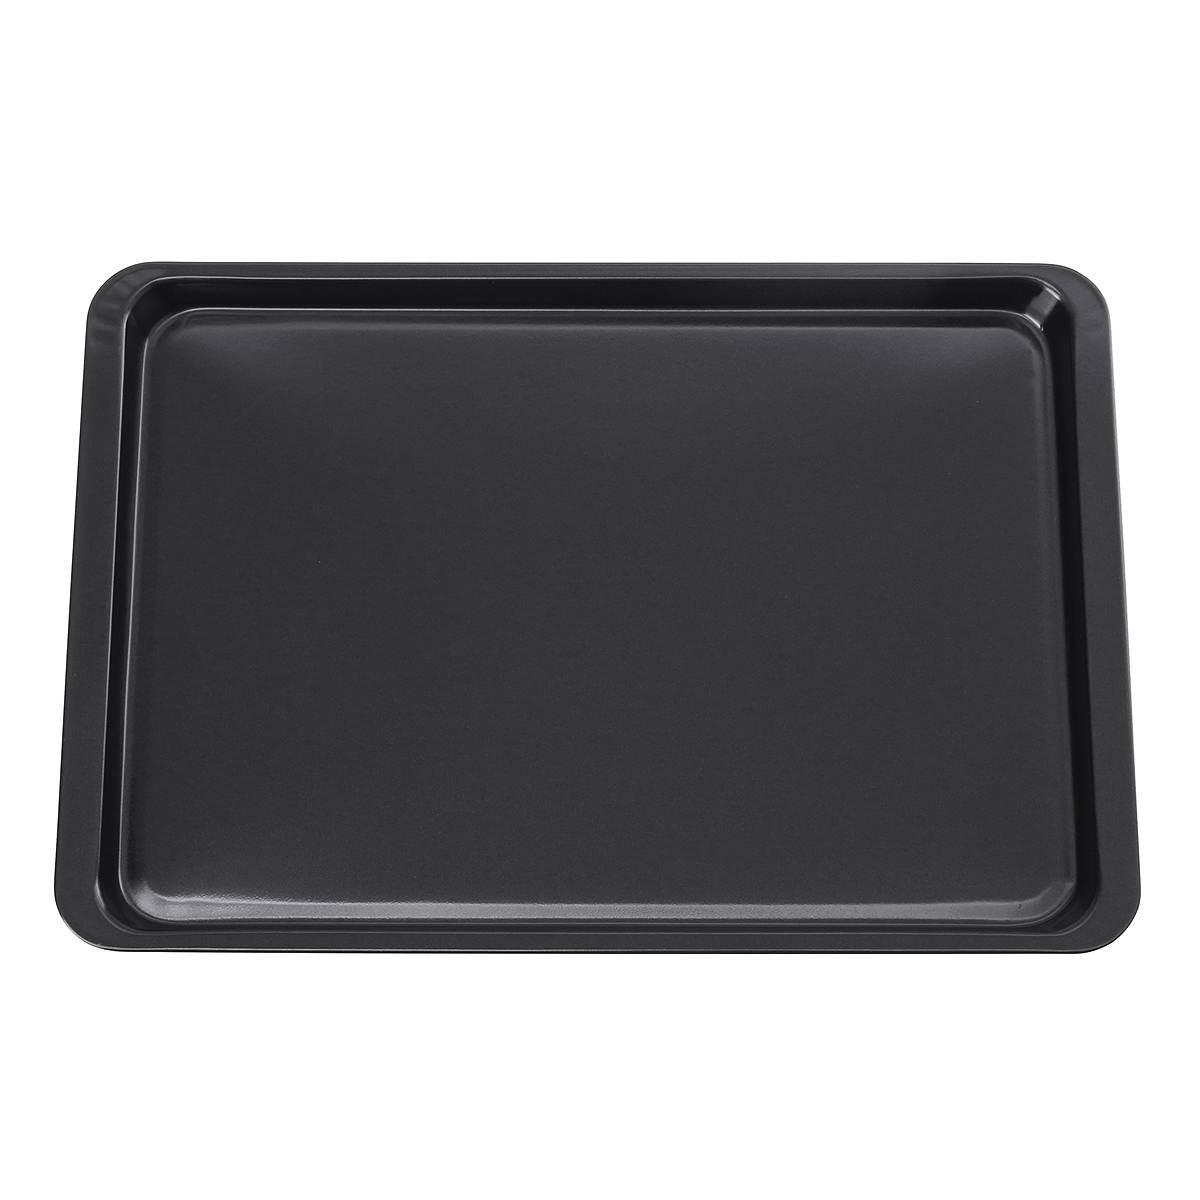 Rectangular Carbon Steel Non-stick Bread Cake Baking Tray Baking Tray Oven Black Baking Tray Diy Baking Pans for Kitchen 14 Inch